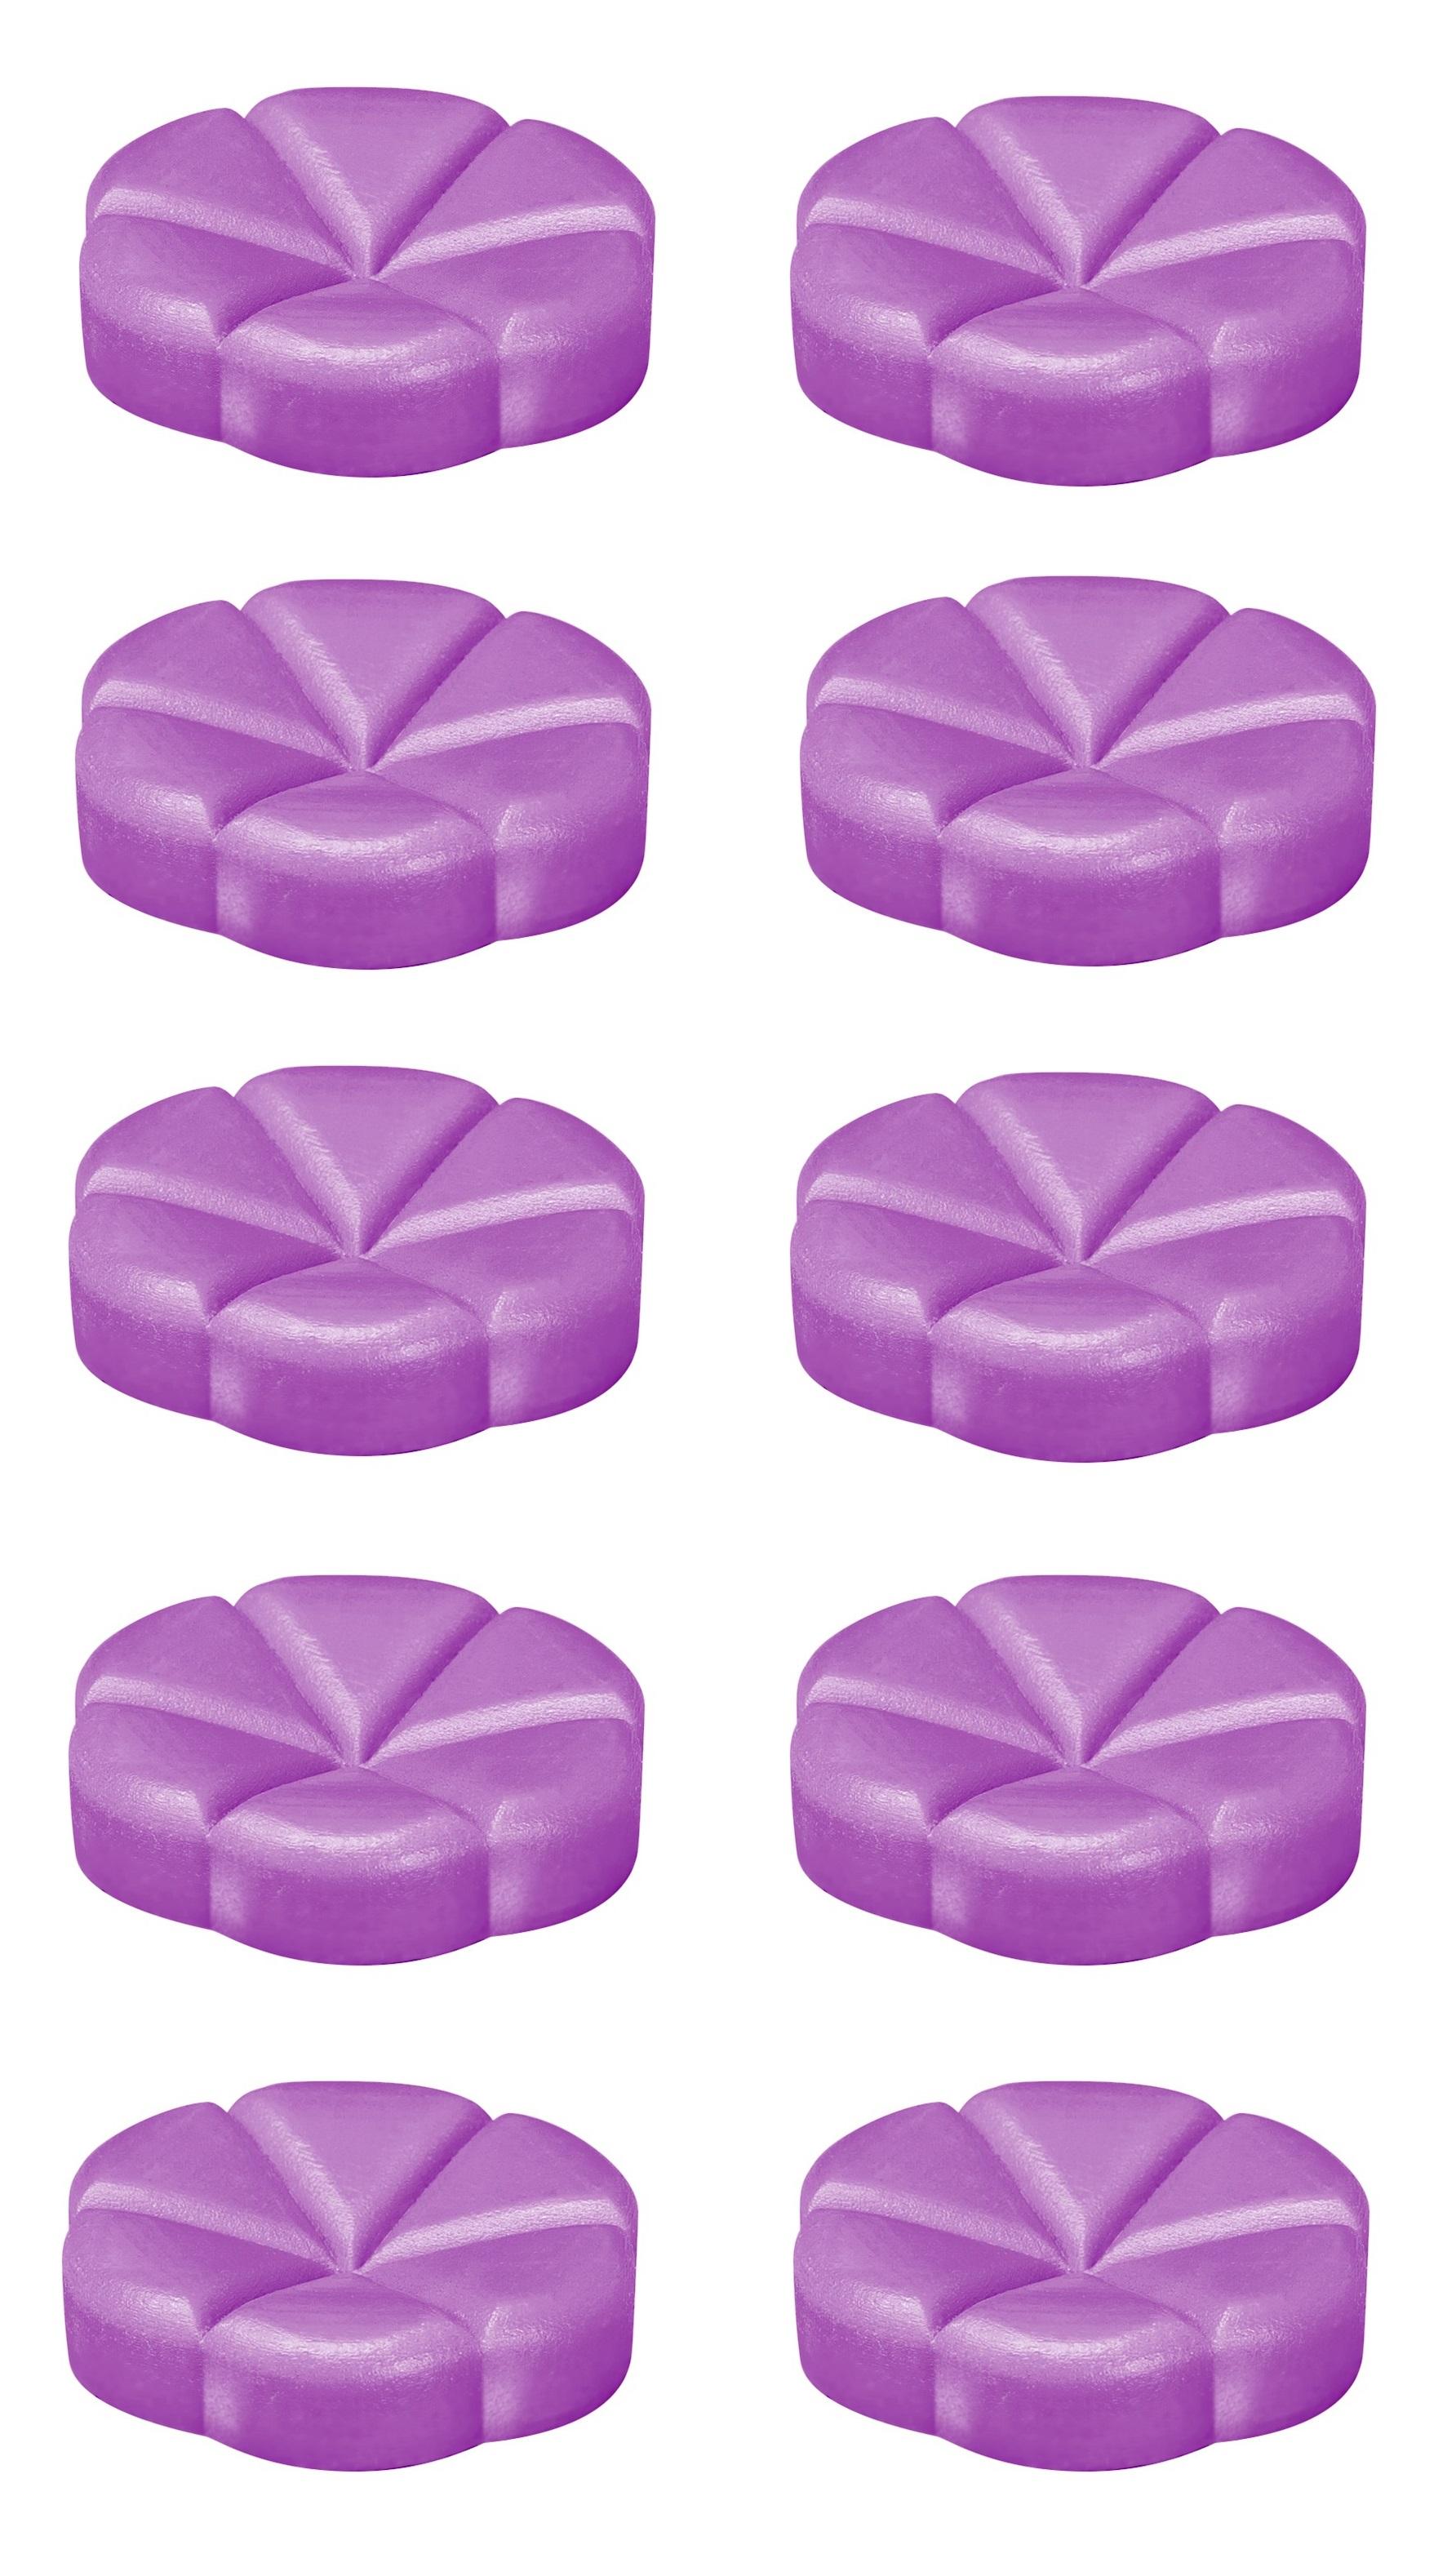 Bolsius geurchips Creations French Lavender - 10 stuks